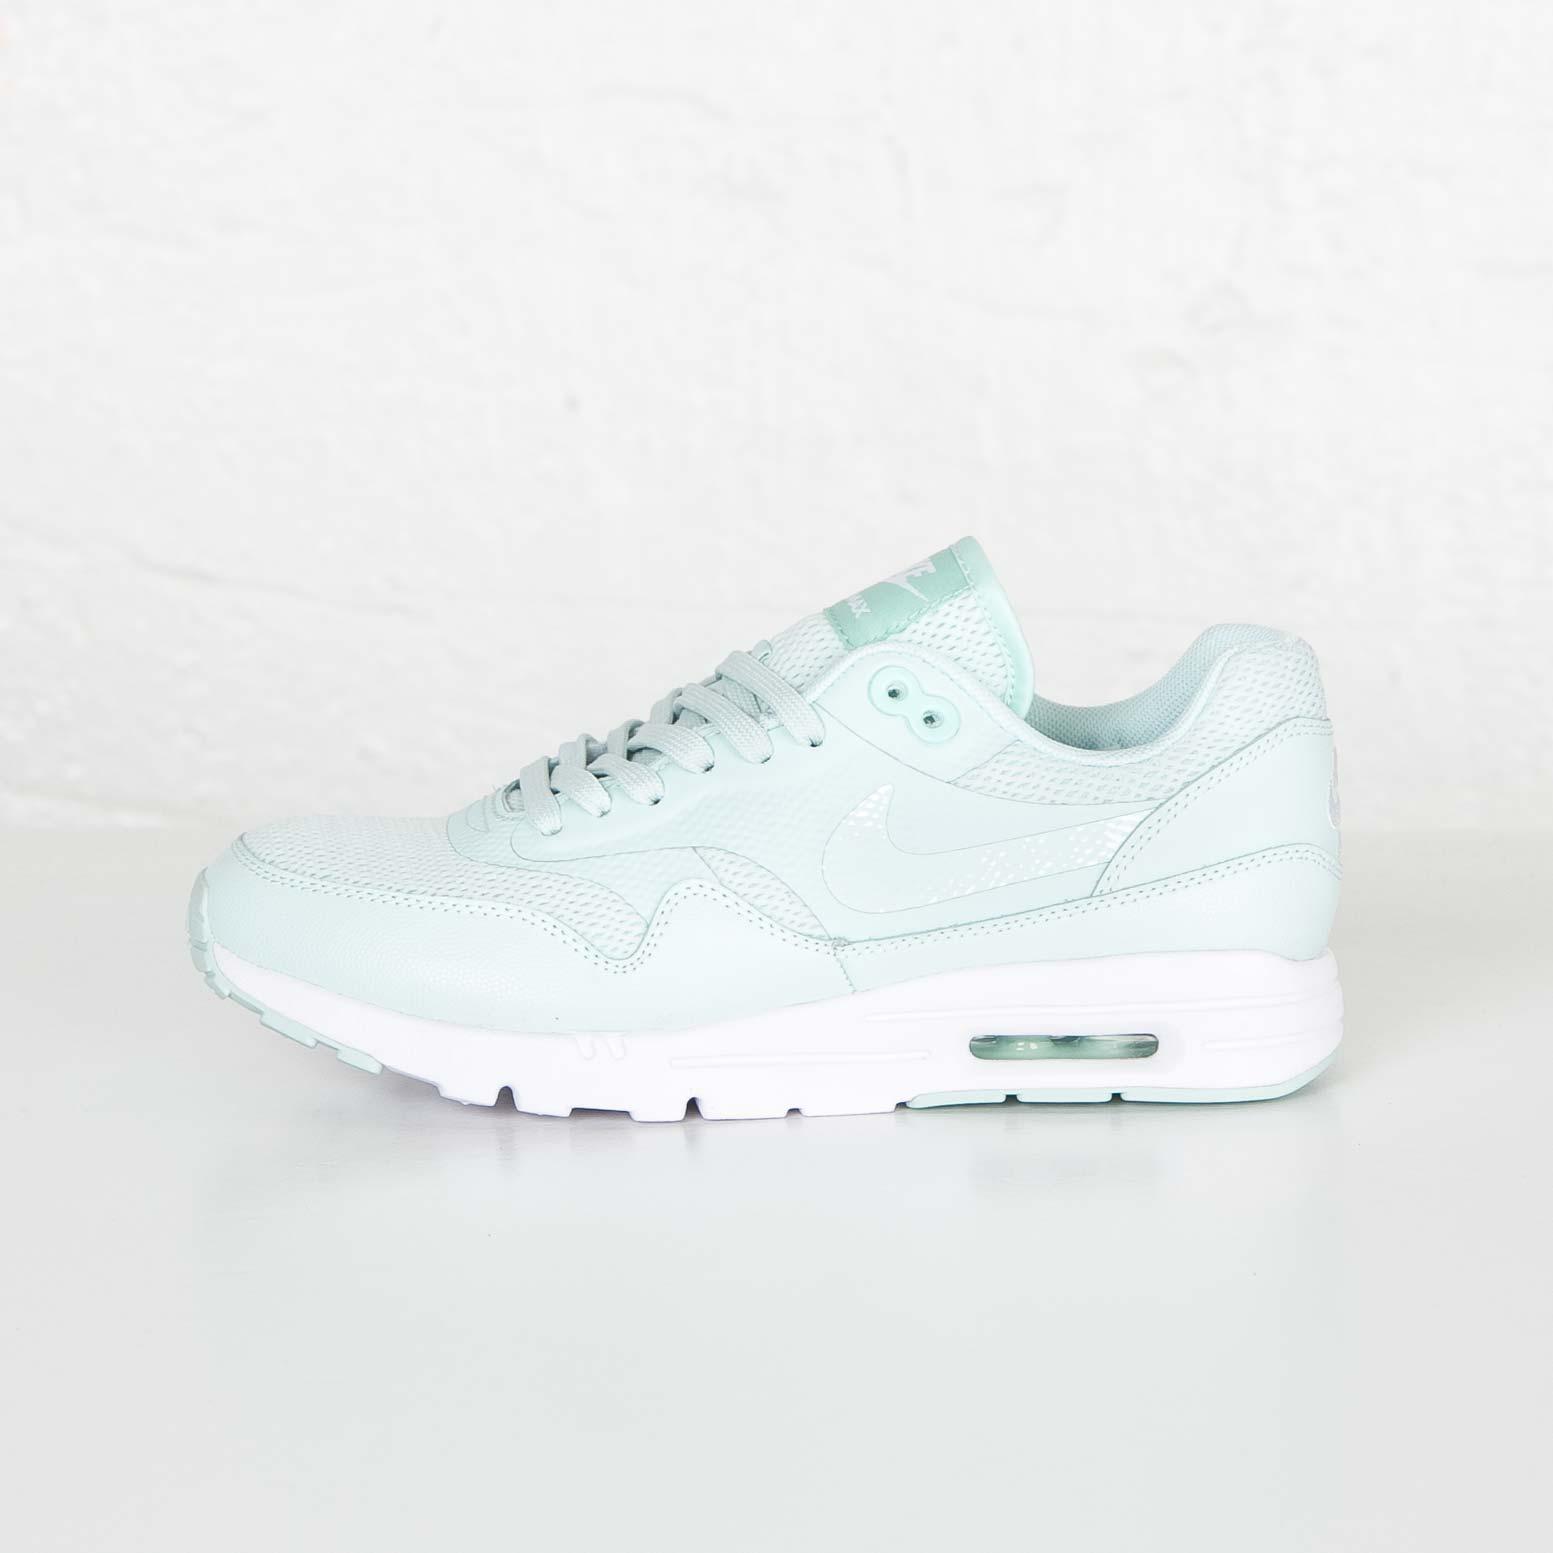 uk availability 882da 60138 Nike Wmns Air Max 1 Ultra Essential - 704993-302 - Sneakersnstuff   sneakers    streetwear på nätet sen 1999